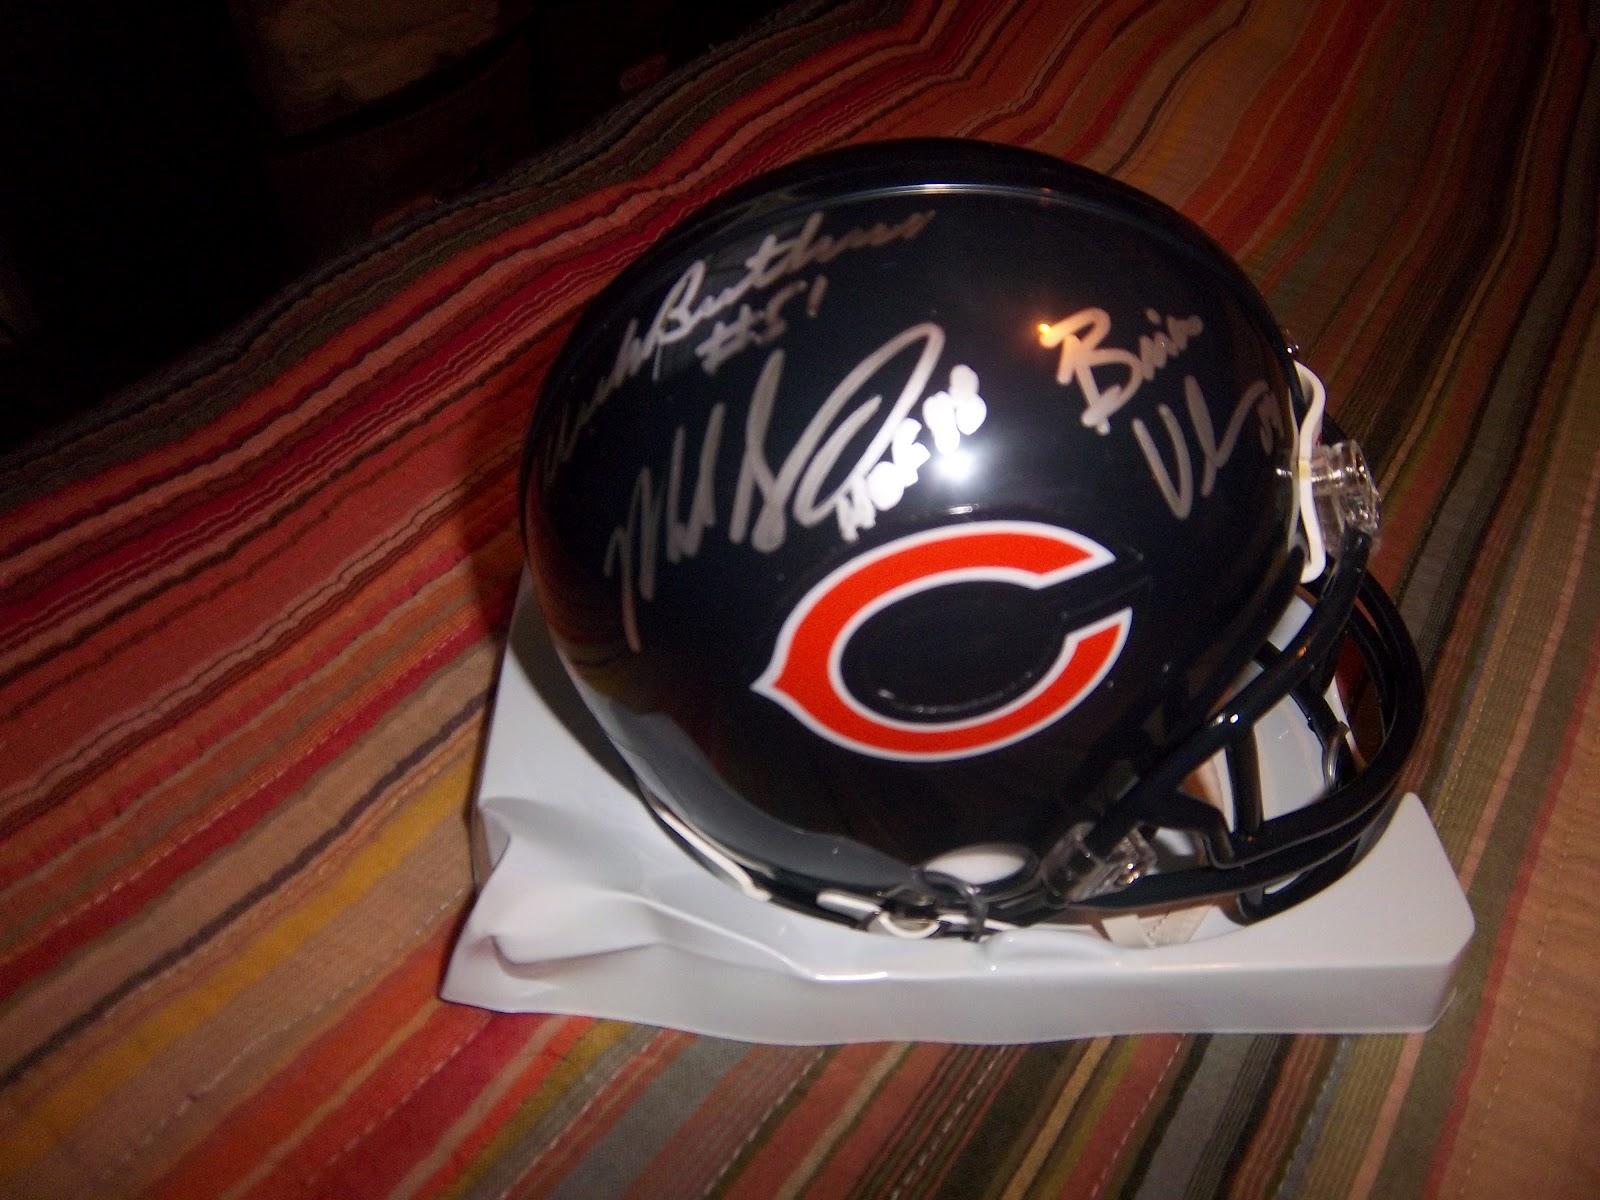 88873f58d06 Awesome Autographs: Dick Butkus, Mike Singletary, Brian Urlacher  Autographed Mini Helmet